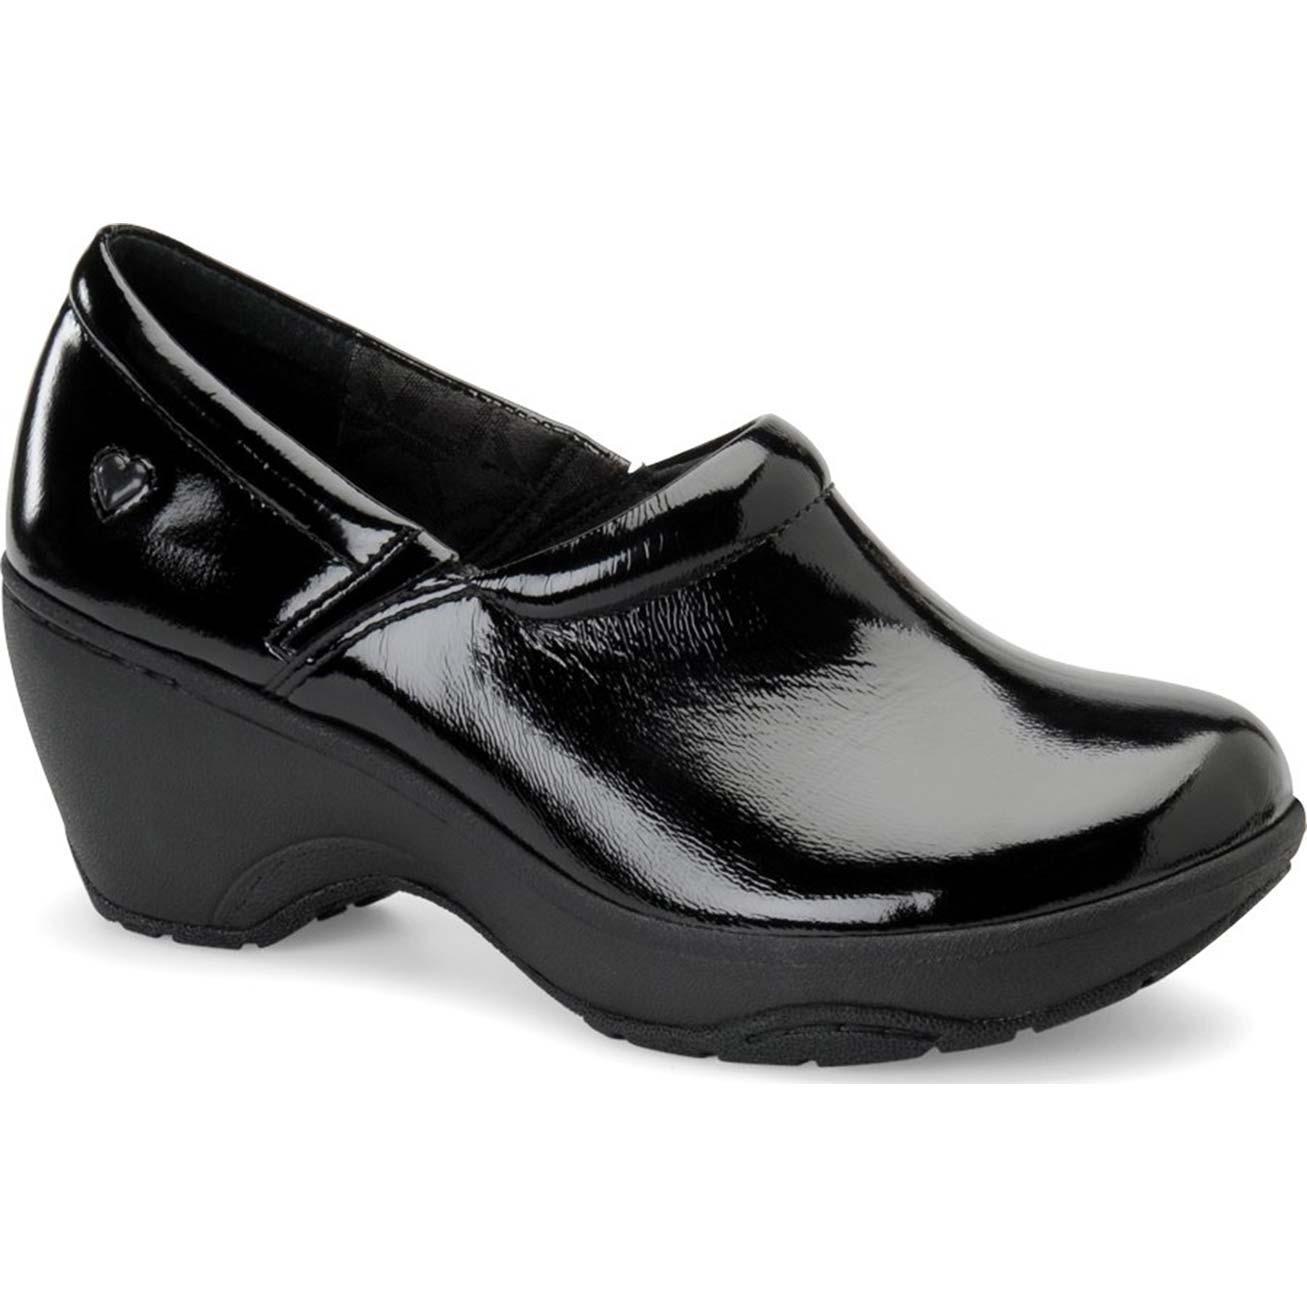 a434ba86531 Nurse Mates Bryar Women's Slip-On Slip-Resistant Shoe